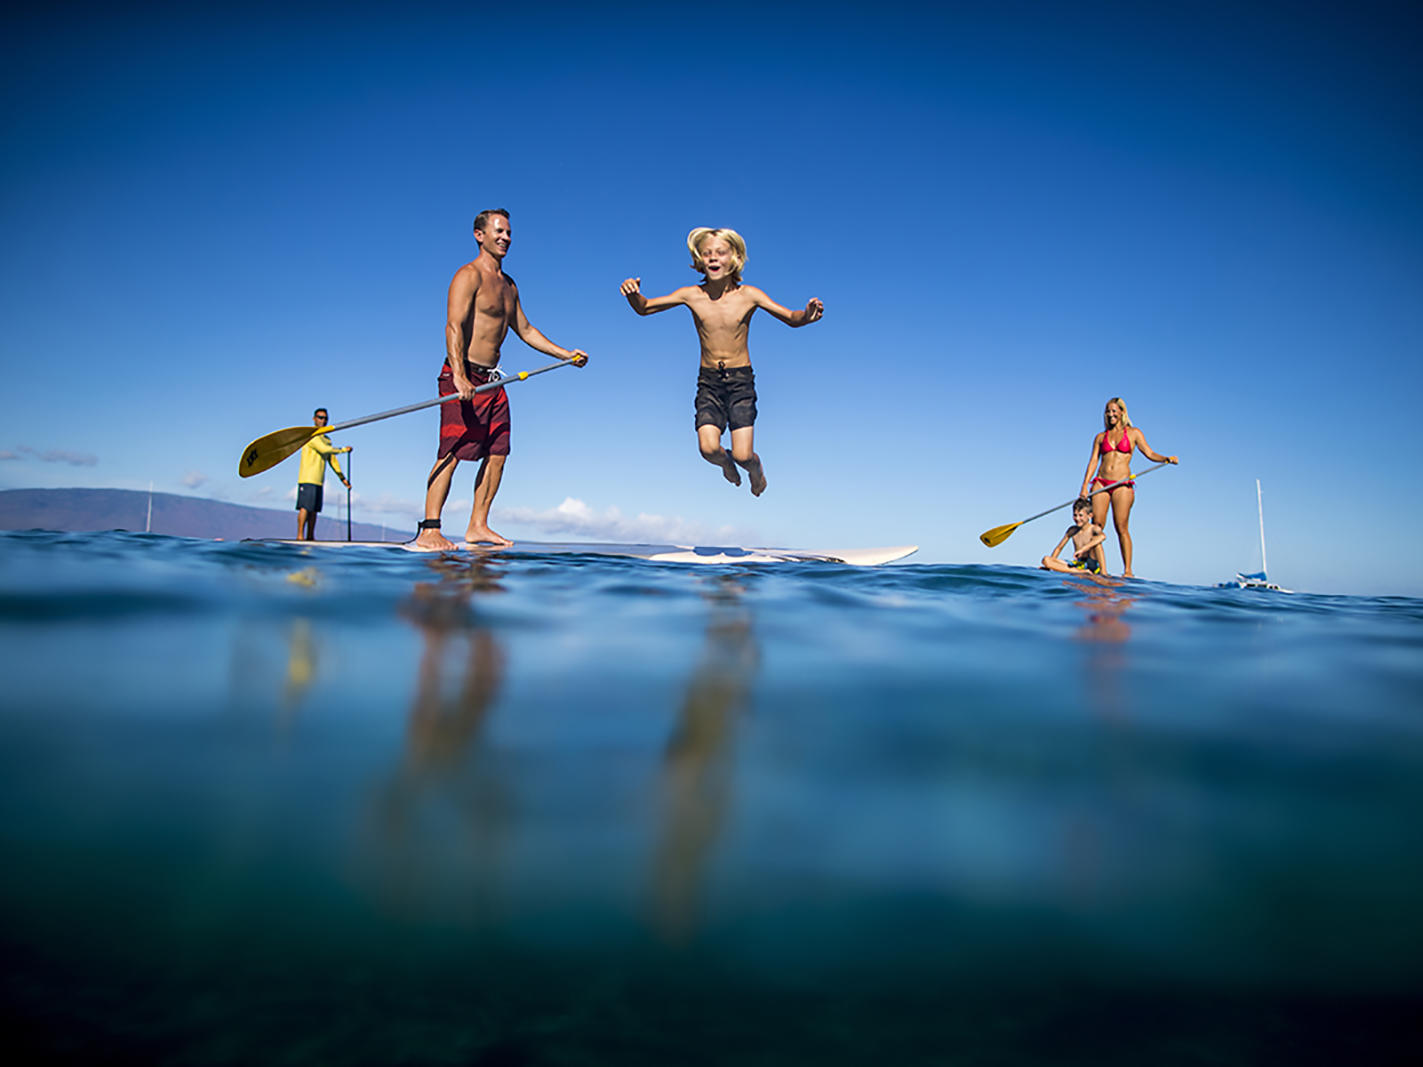 boy jumping off paddleboard